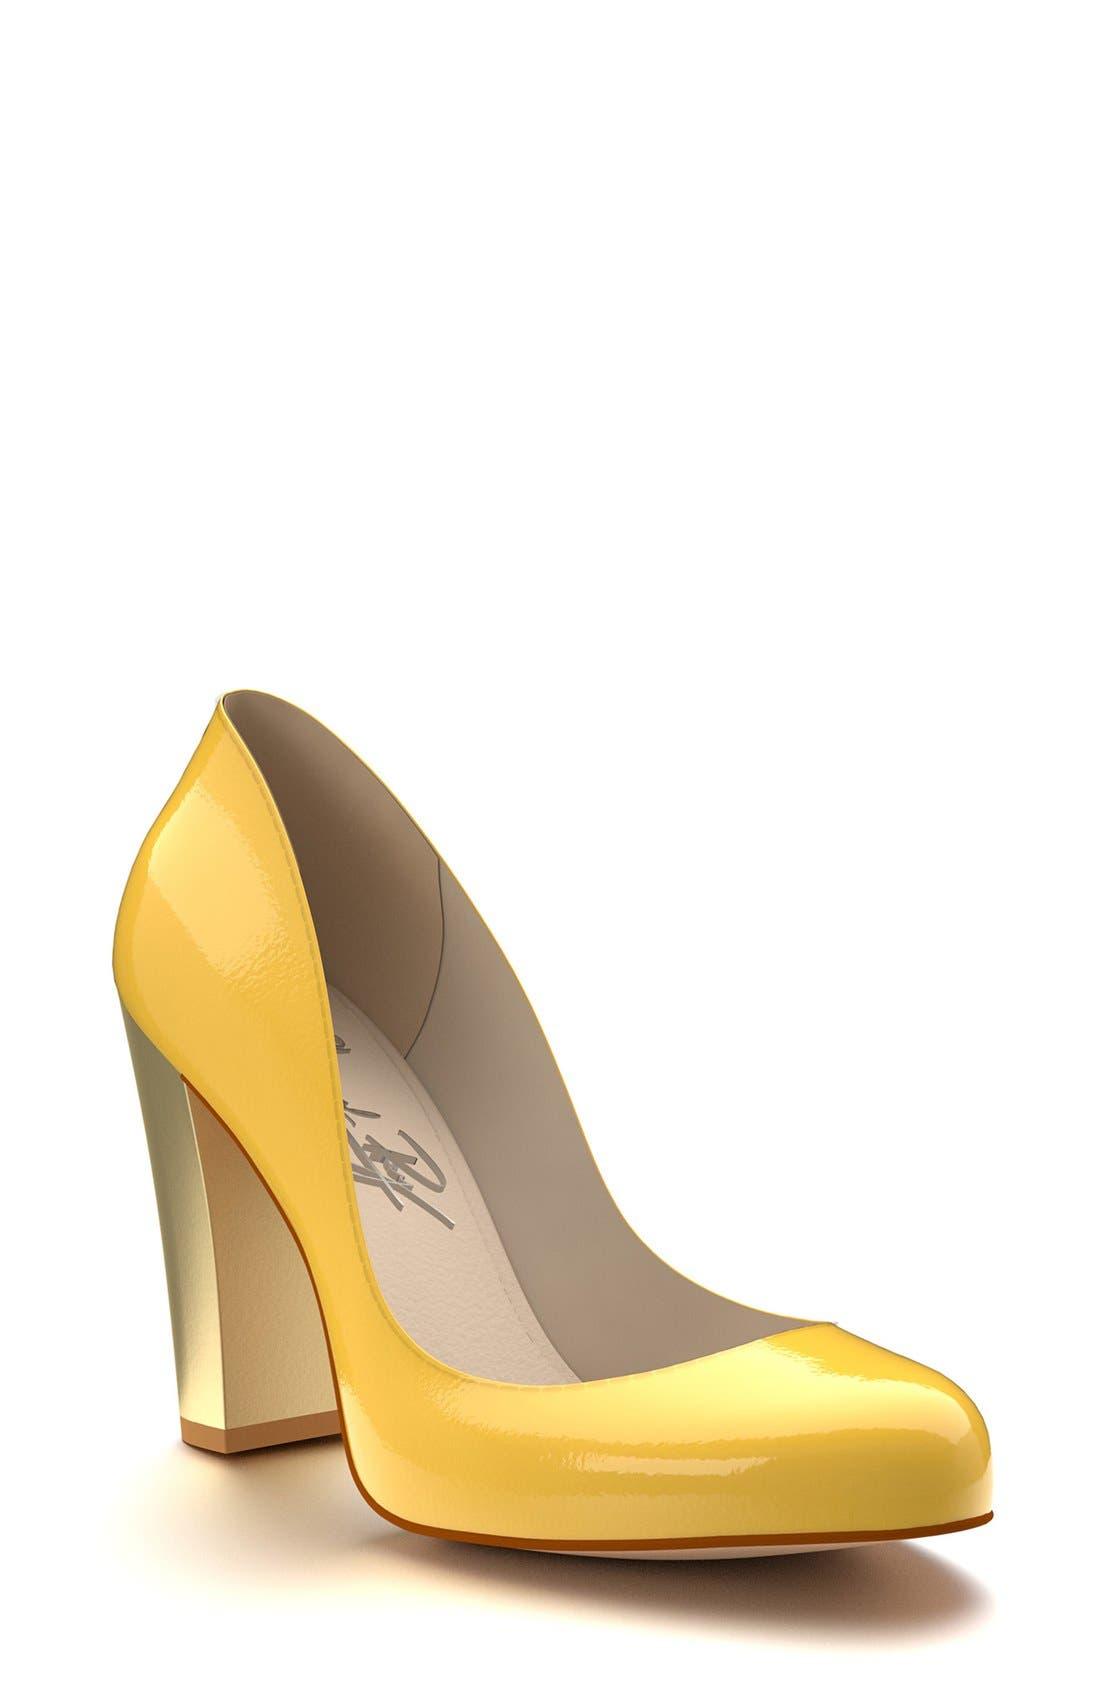 Alternate Image 1 Selected - Shoes of Prey Block Heel  Pump (Women)